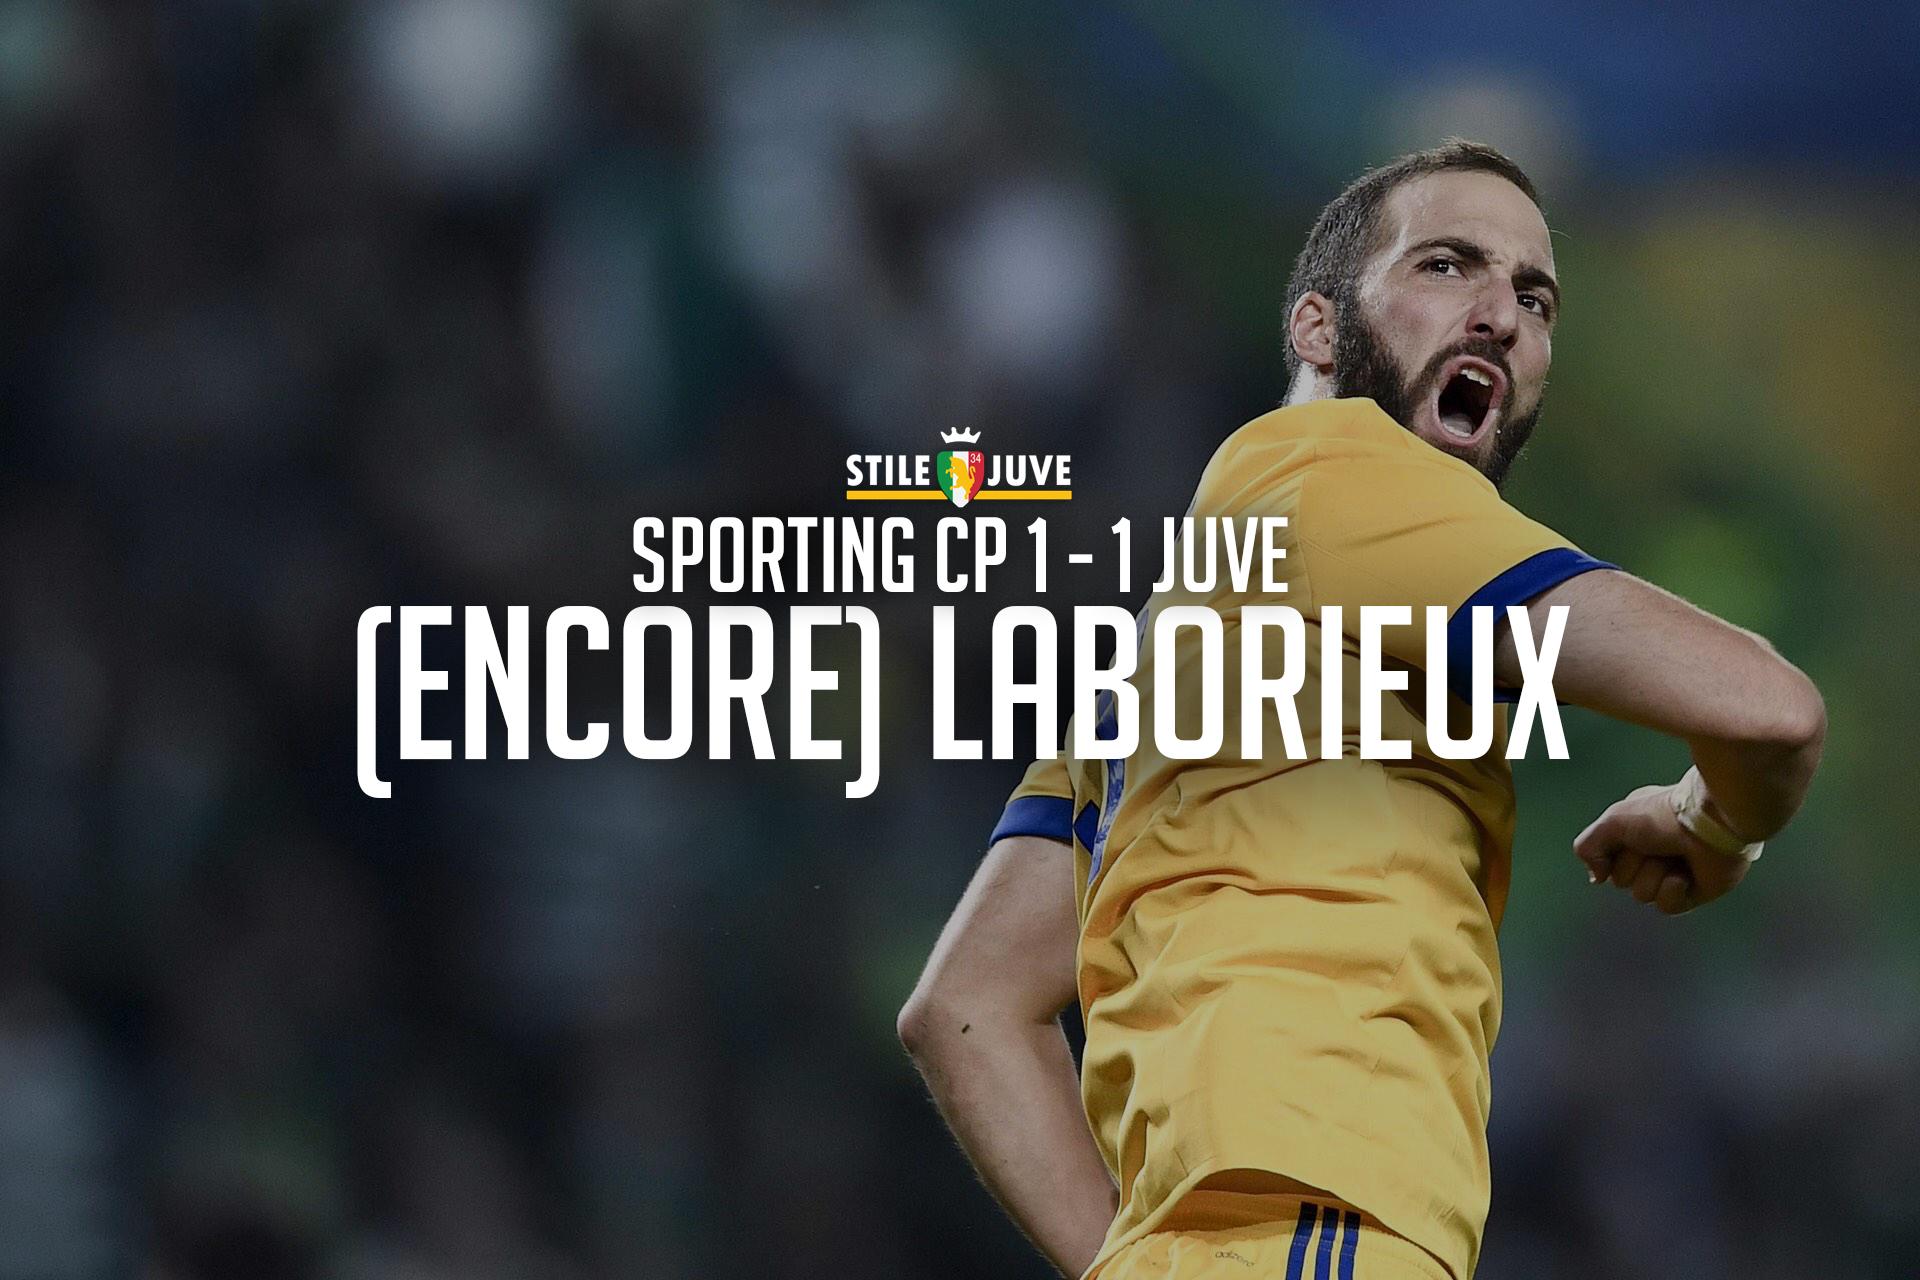 Maillot Sporting CP Bruno César